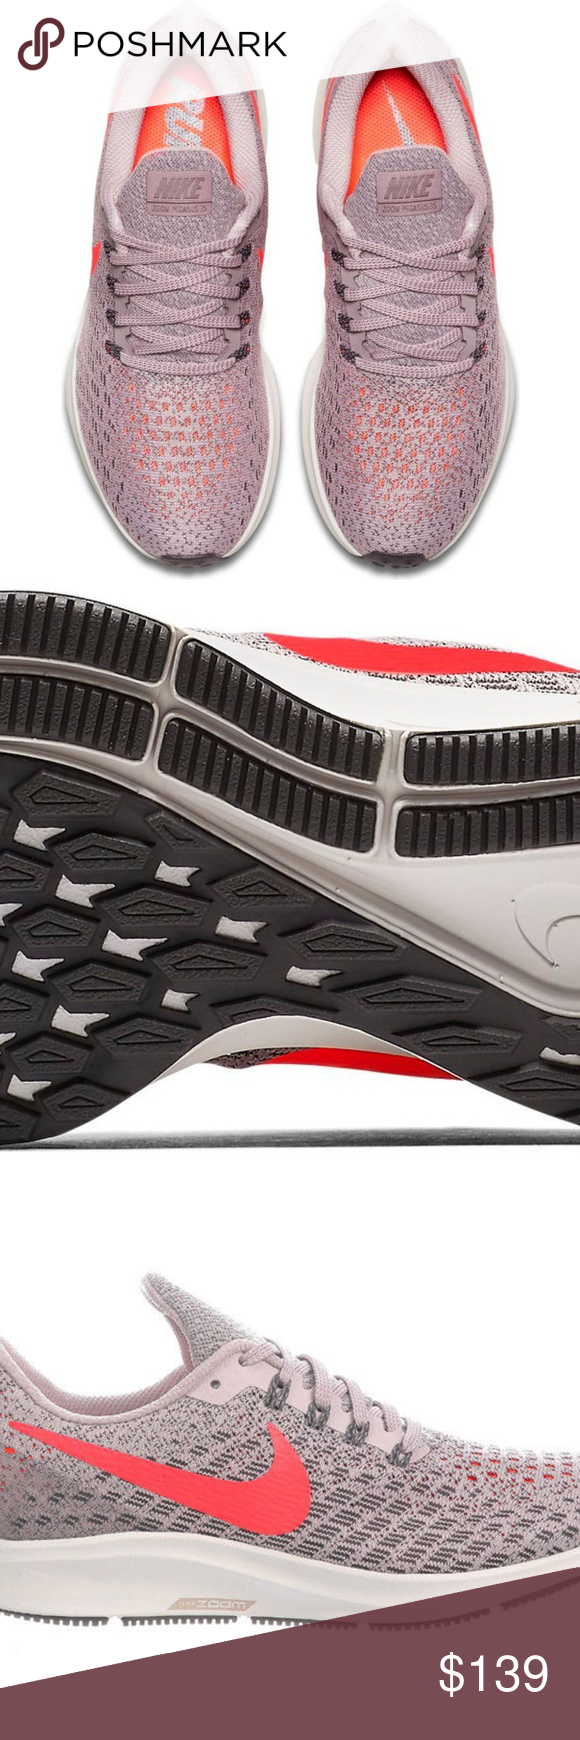 3490b1cee9e6 Nike Wmns Air Zoom Pegasus 35 Women Running Shoes Nike Wmns Air Zoom  Pegasus 35 Women